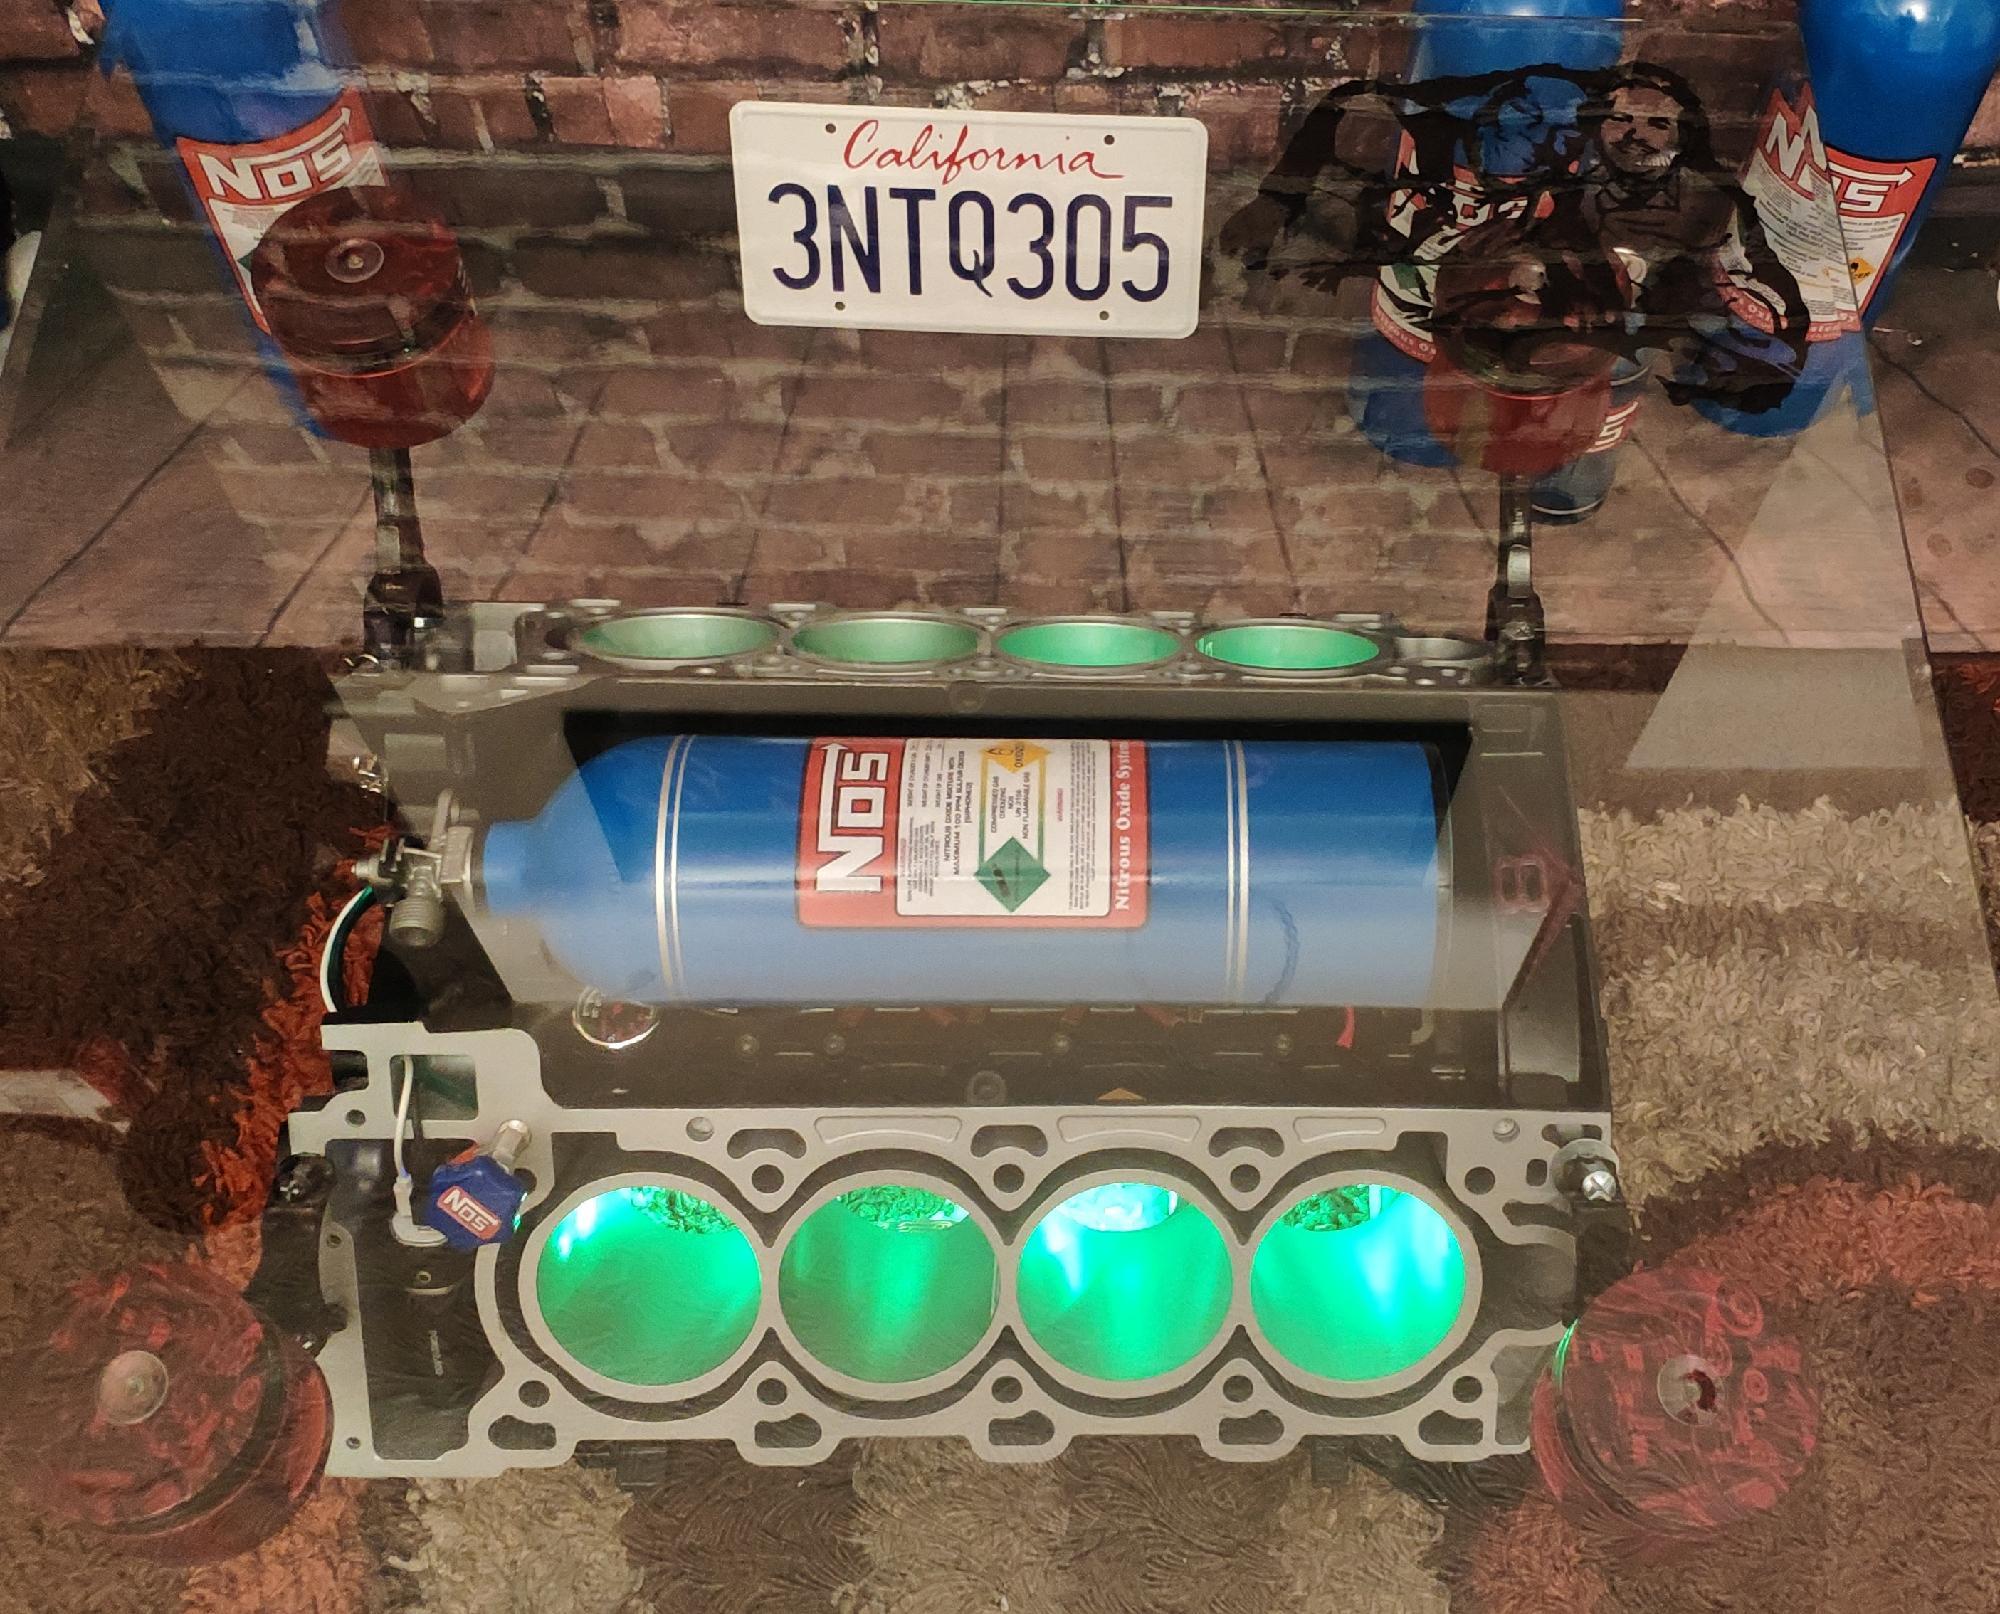 Tyrese Gibson's bespoke engine table